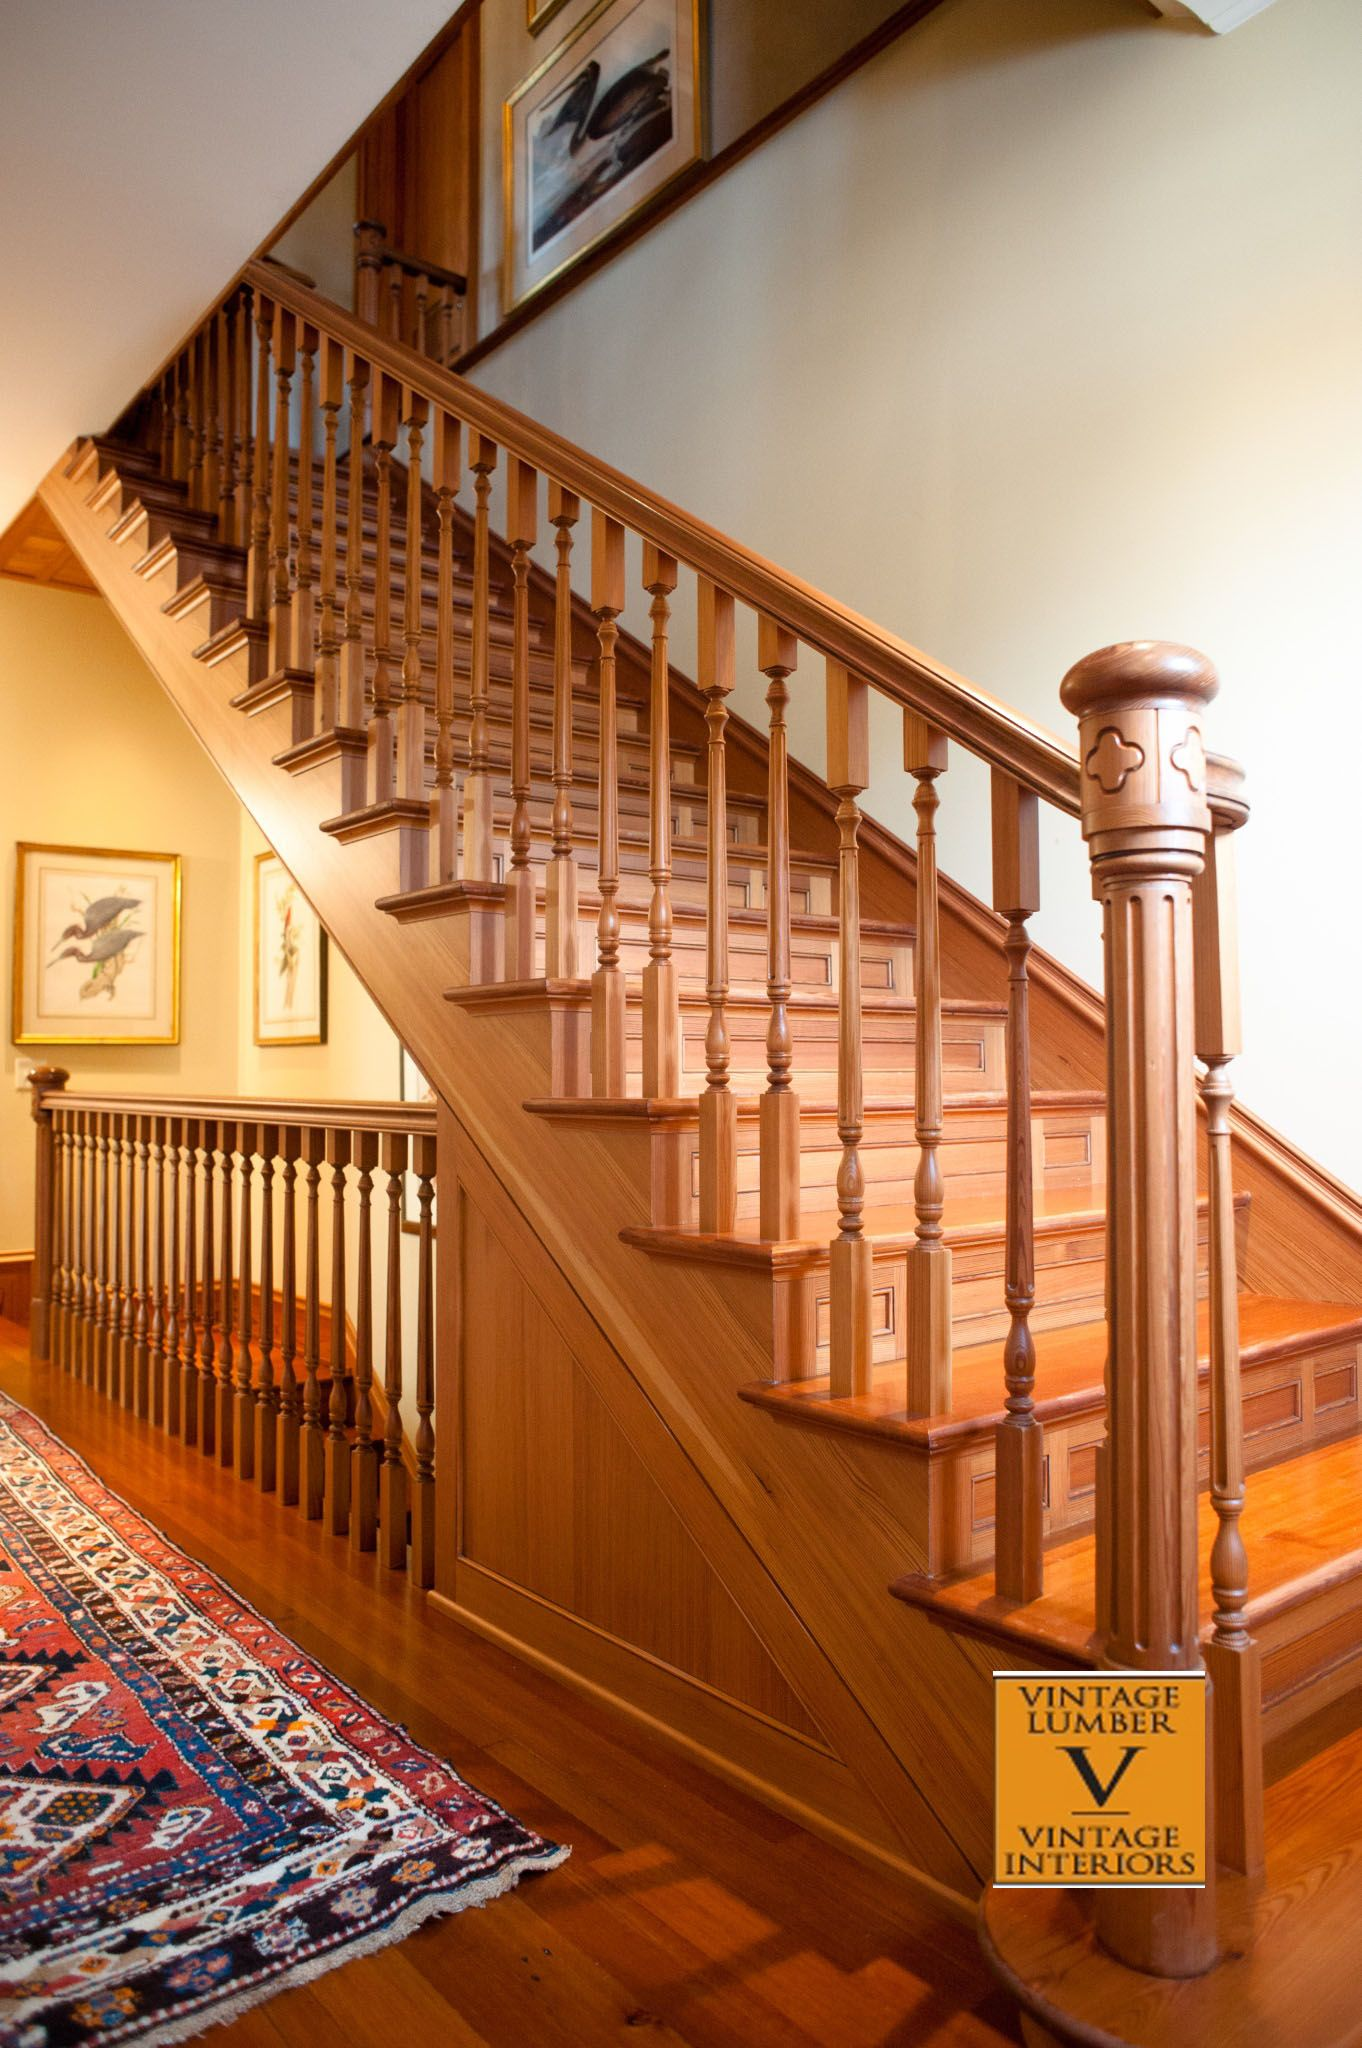 Gallery Photos Vintage Lumber Sales How To Antique Wood Wood Stairs Lumber